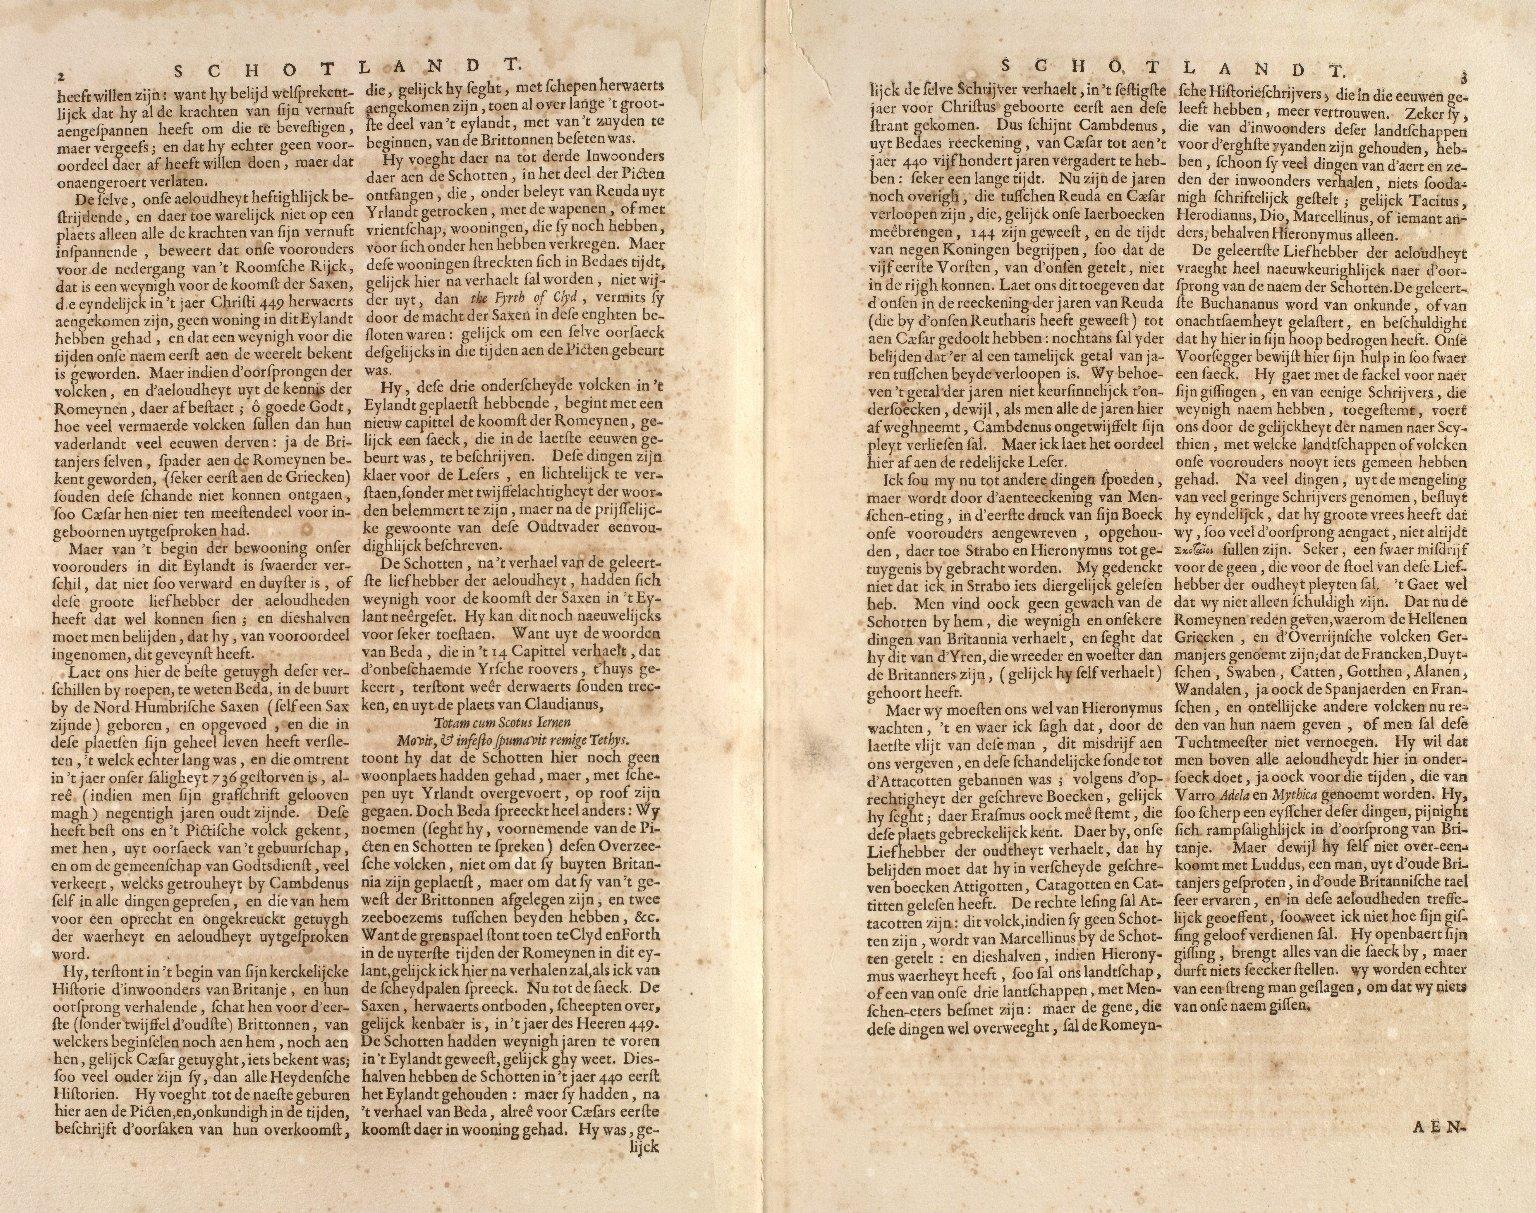 [Geographiae Blavianae] [Also known as: Atlas major] [009 of 153]